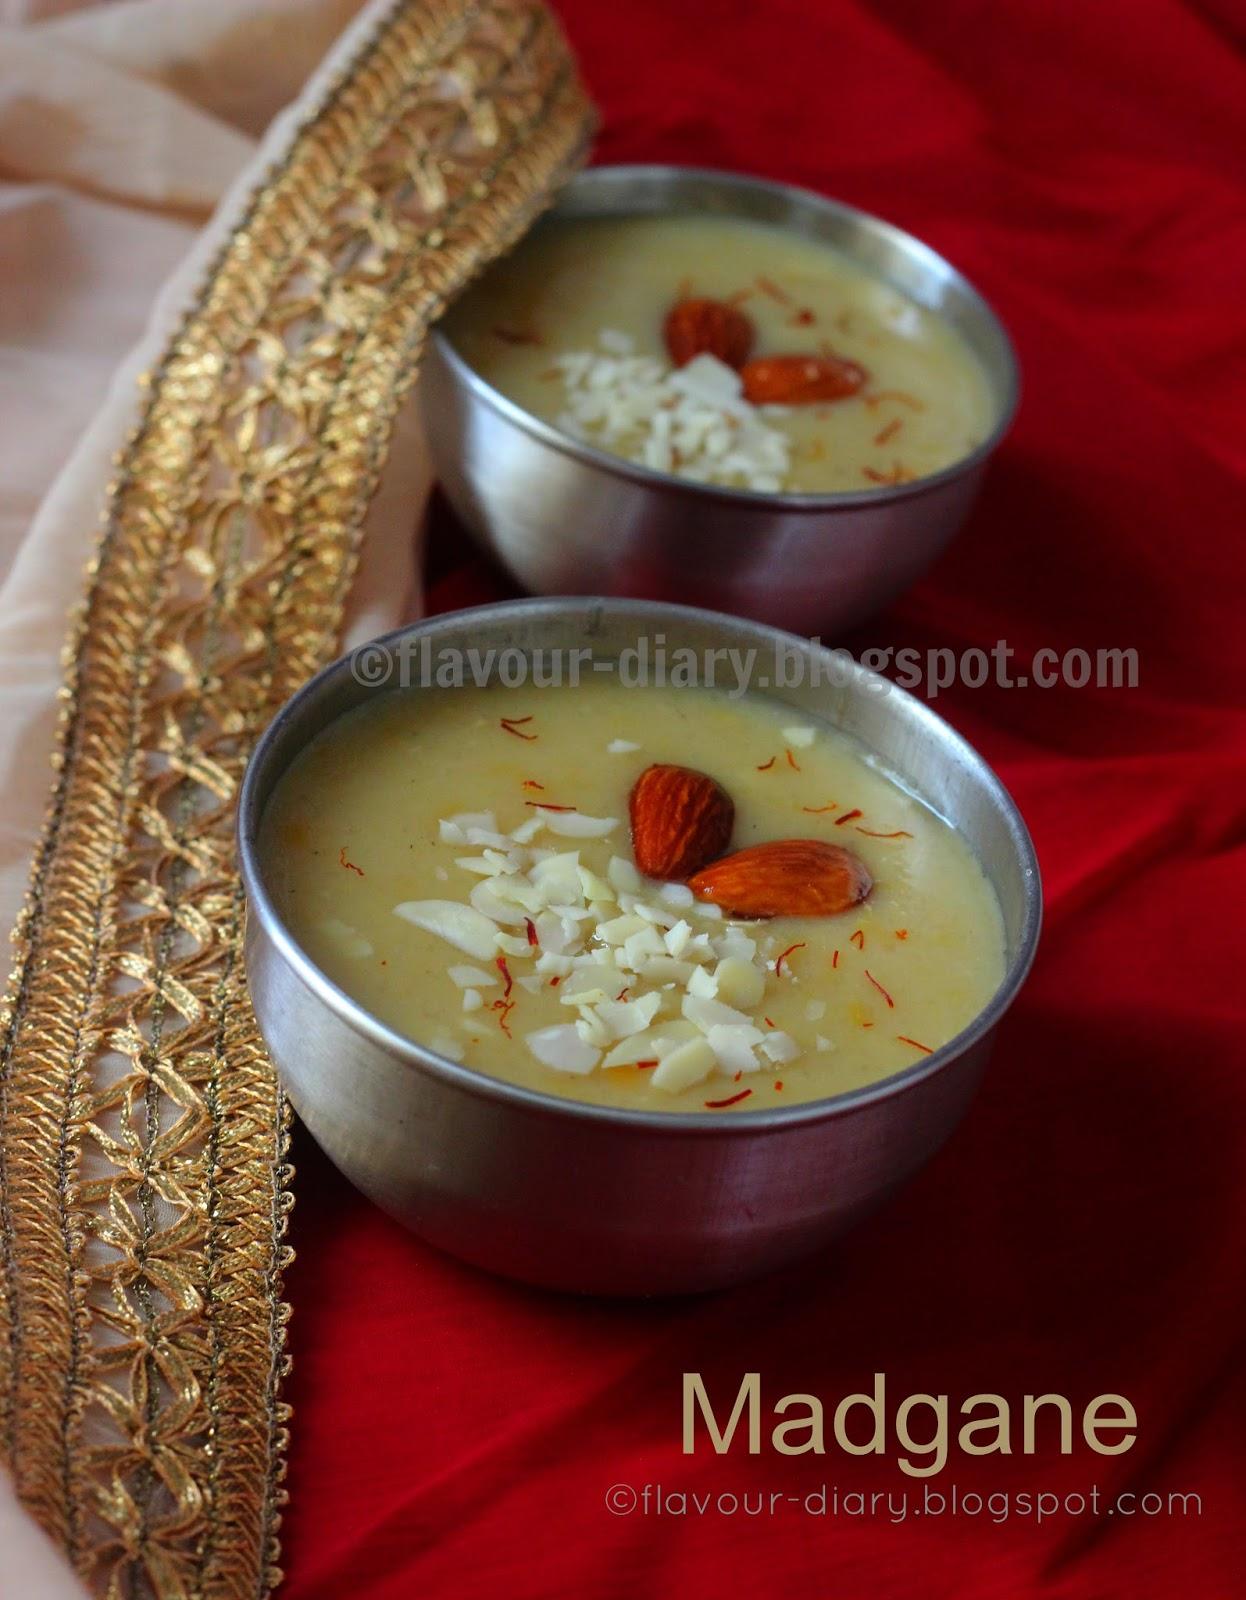 Madgane Konkani Dessert